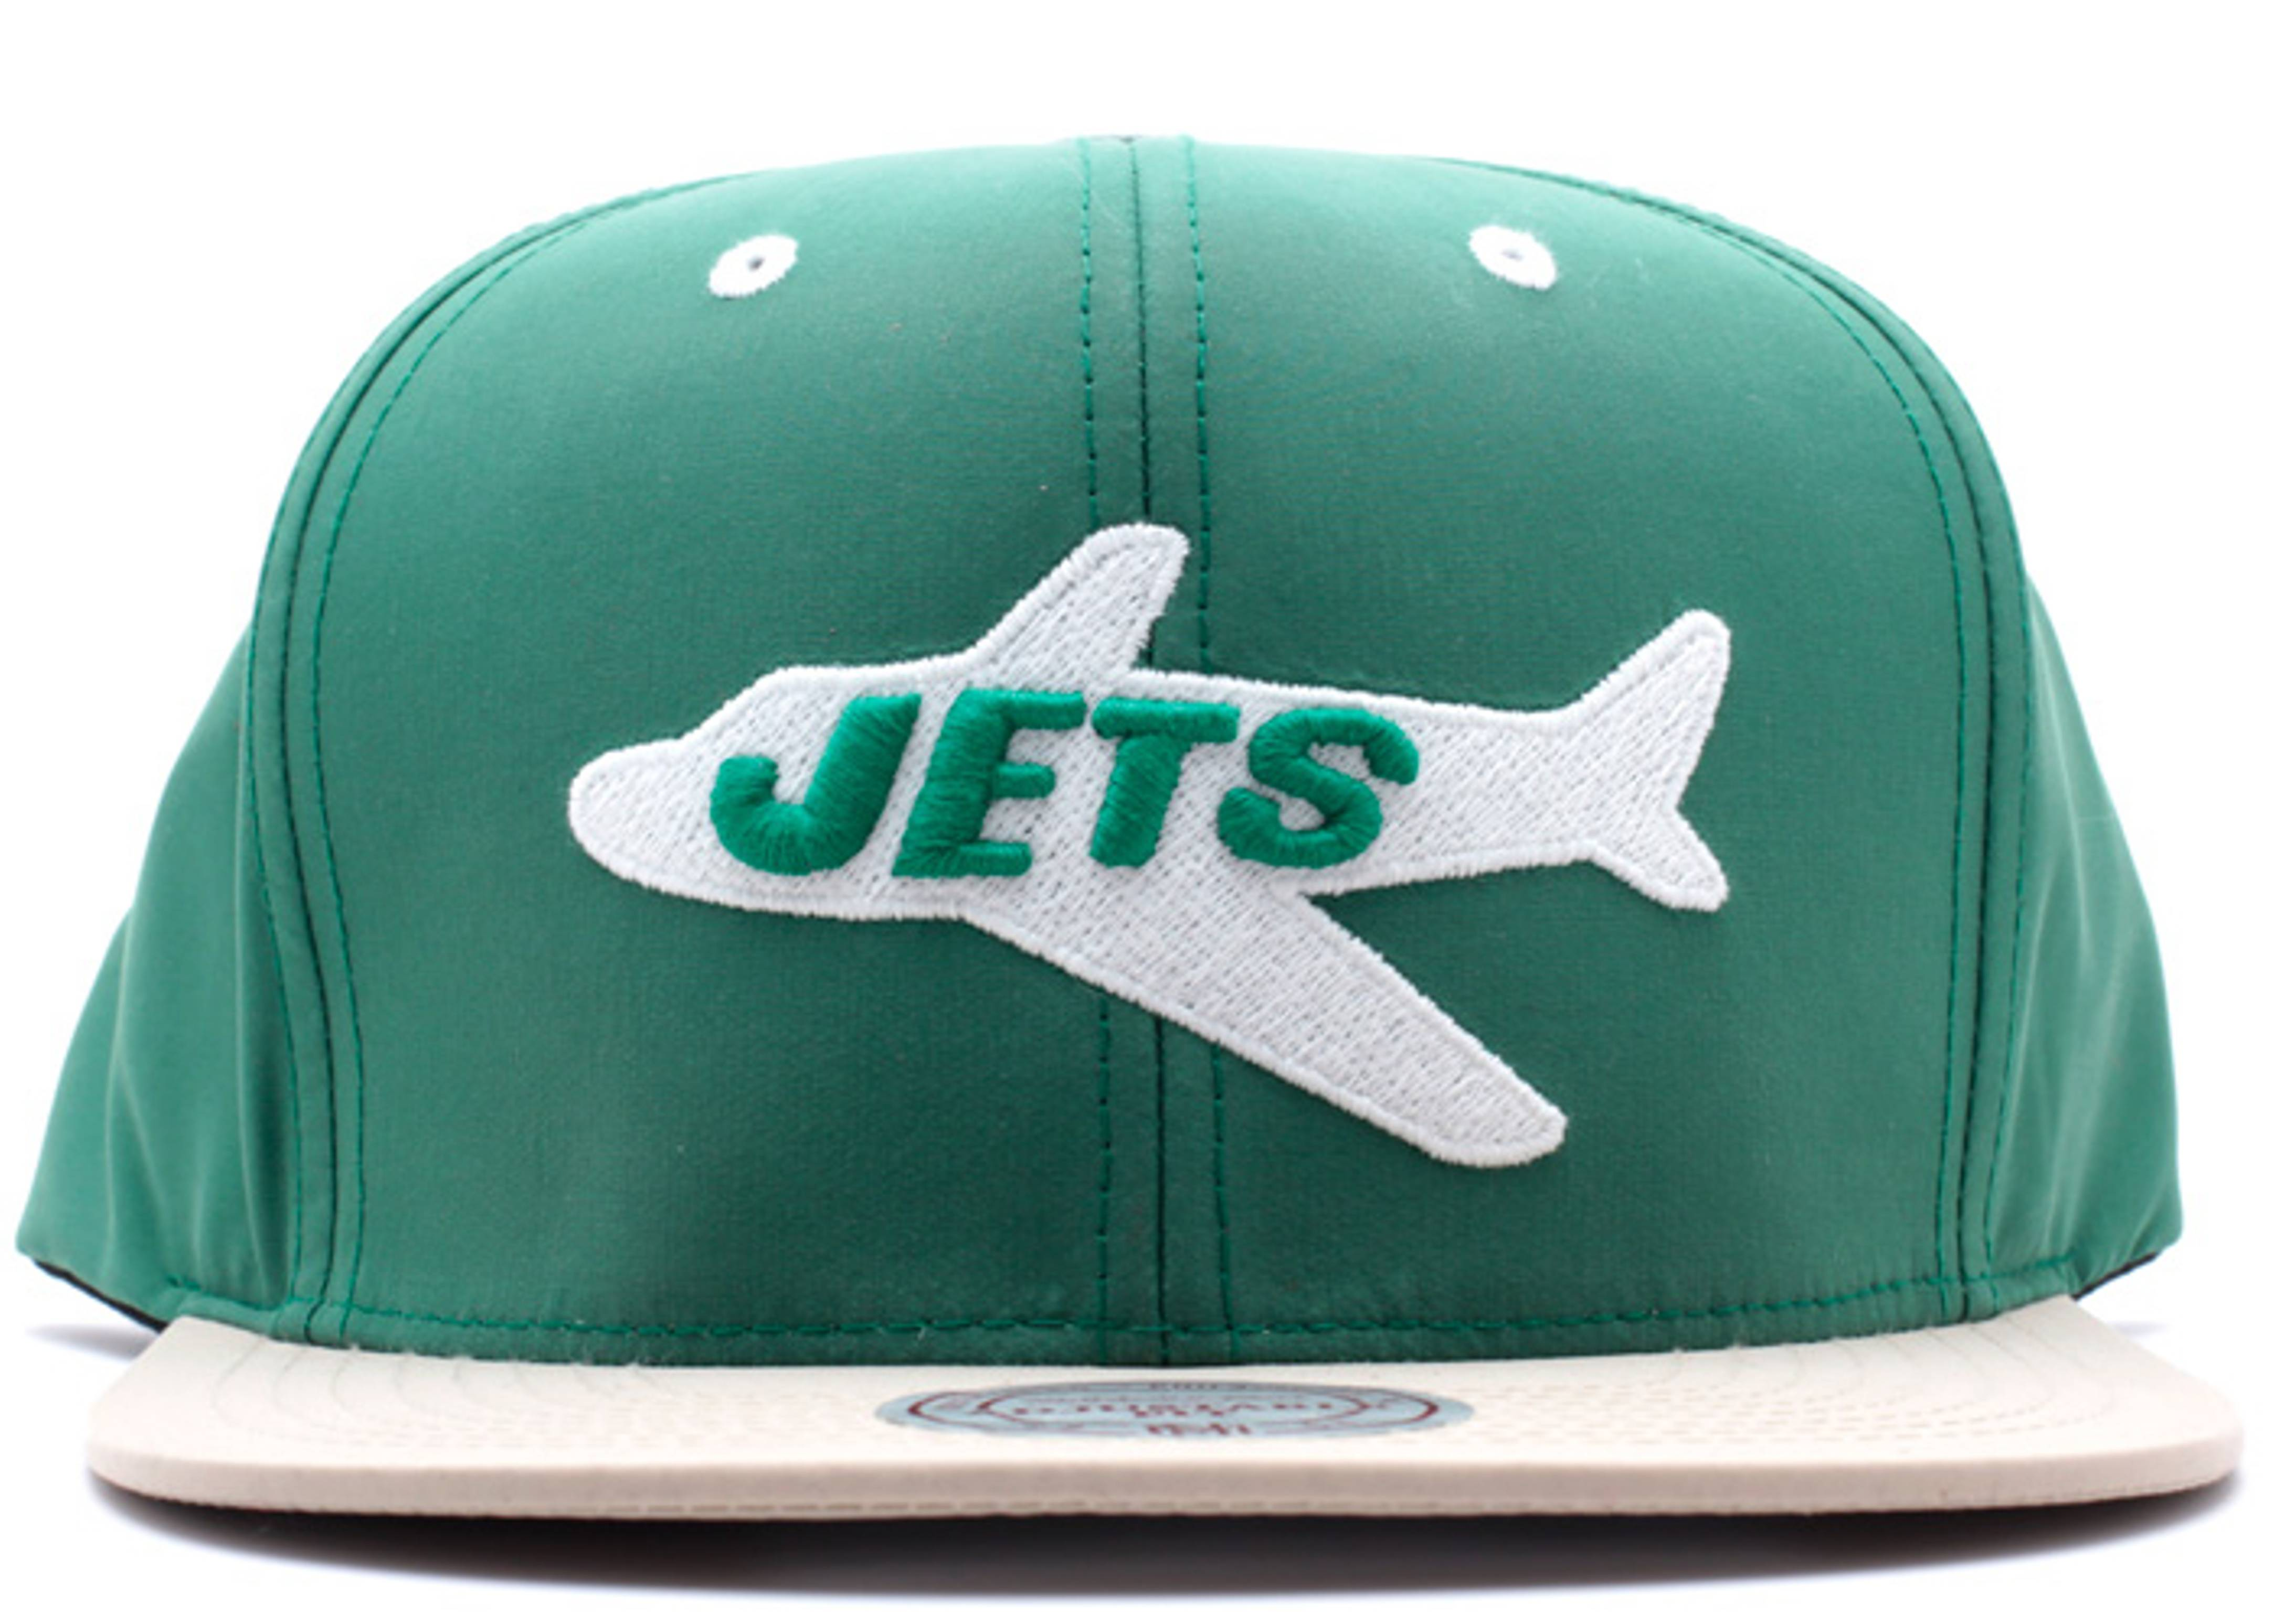 new york jets strap-back